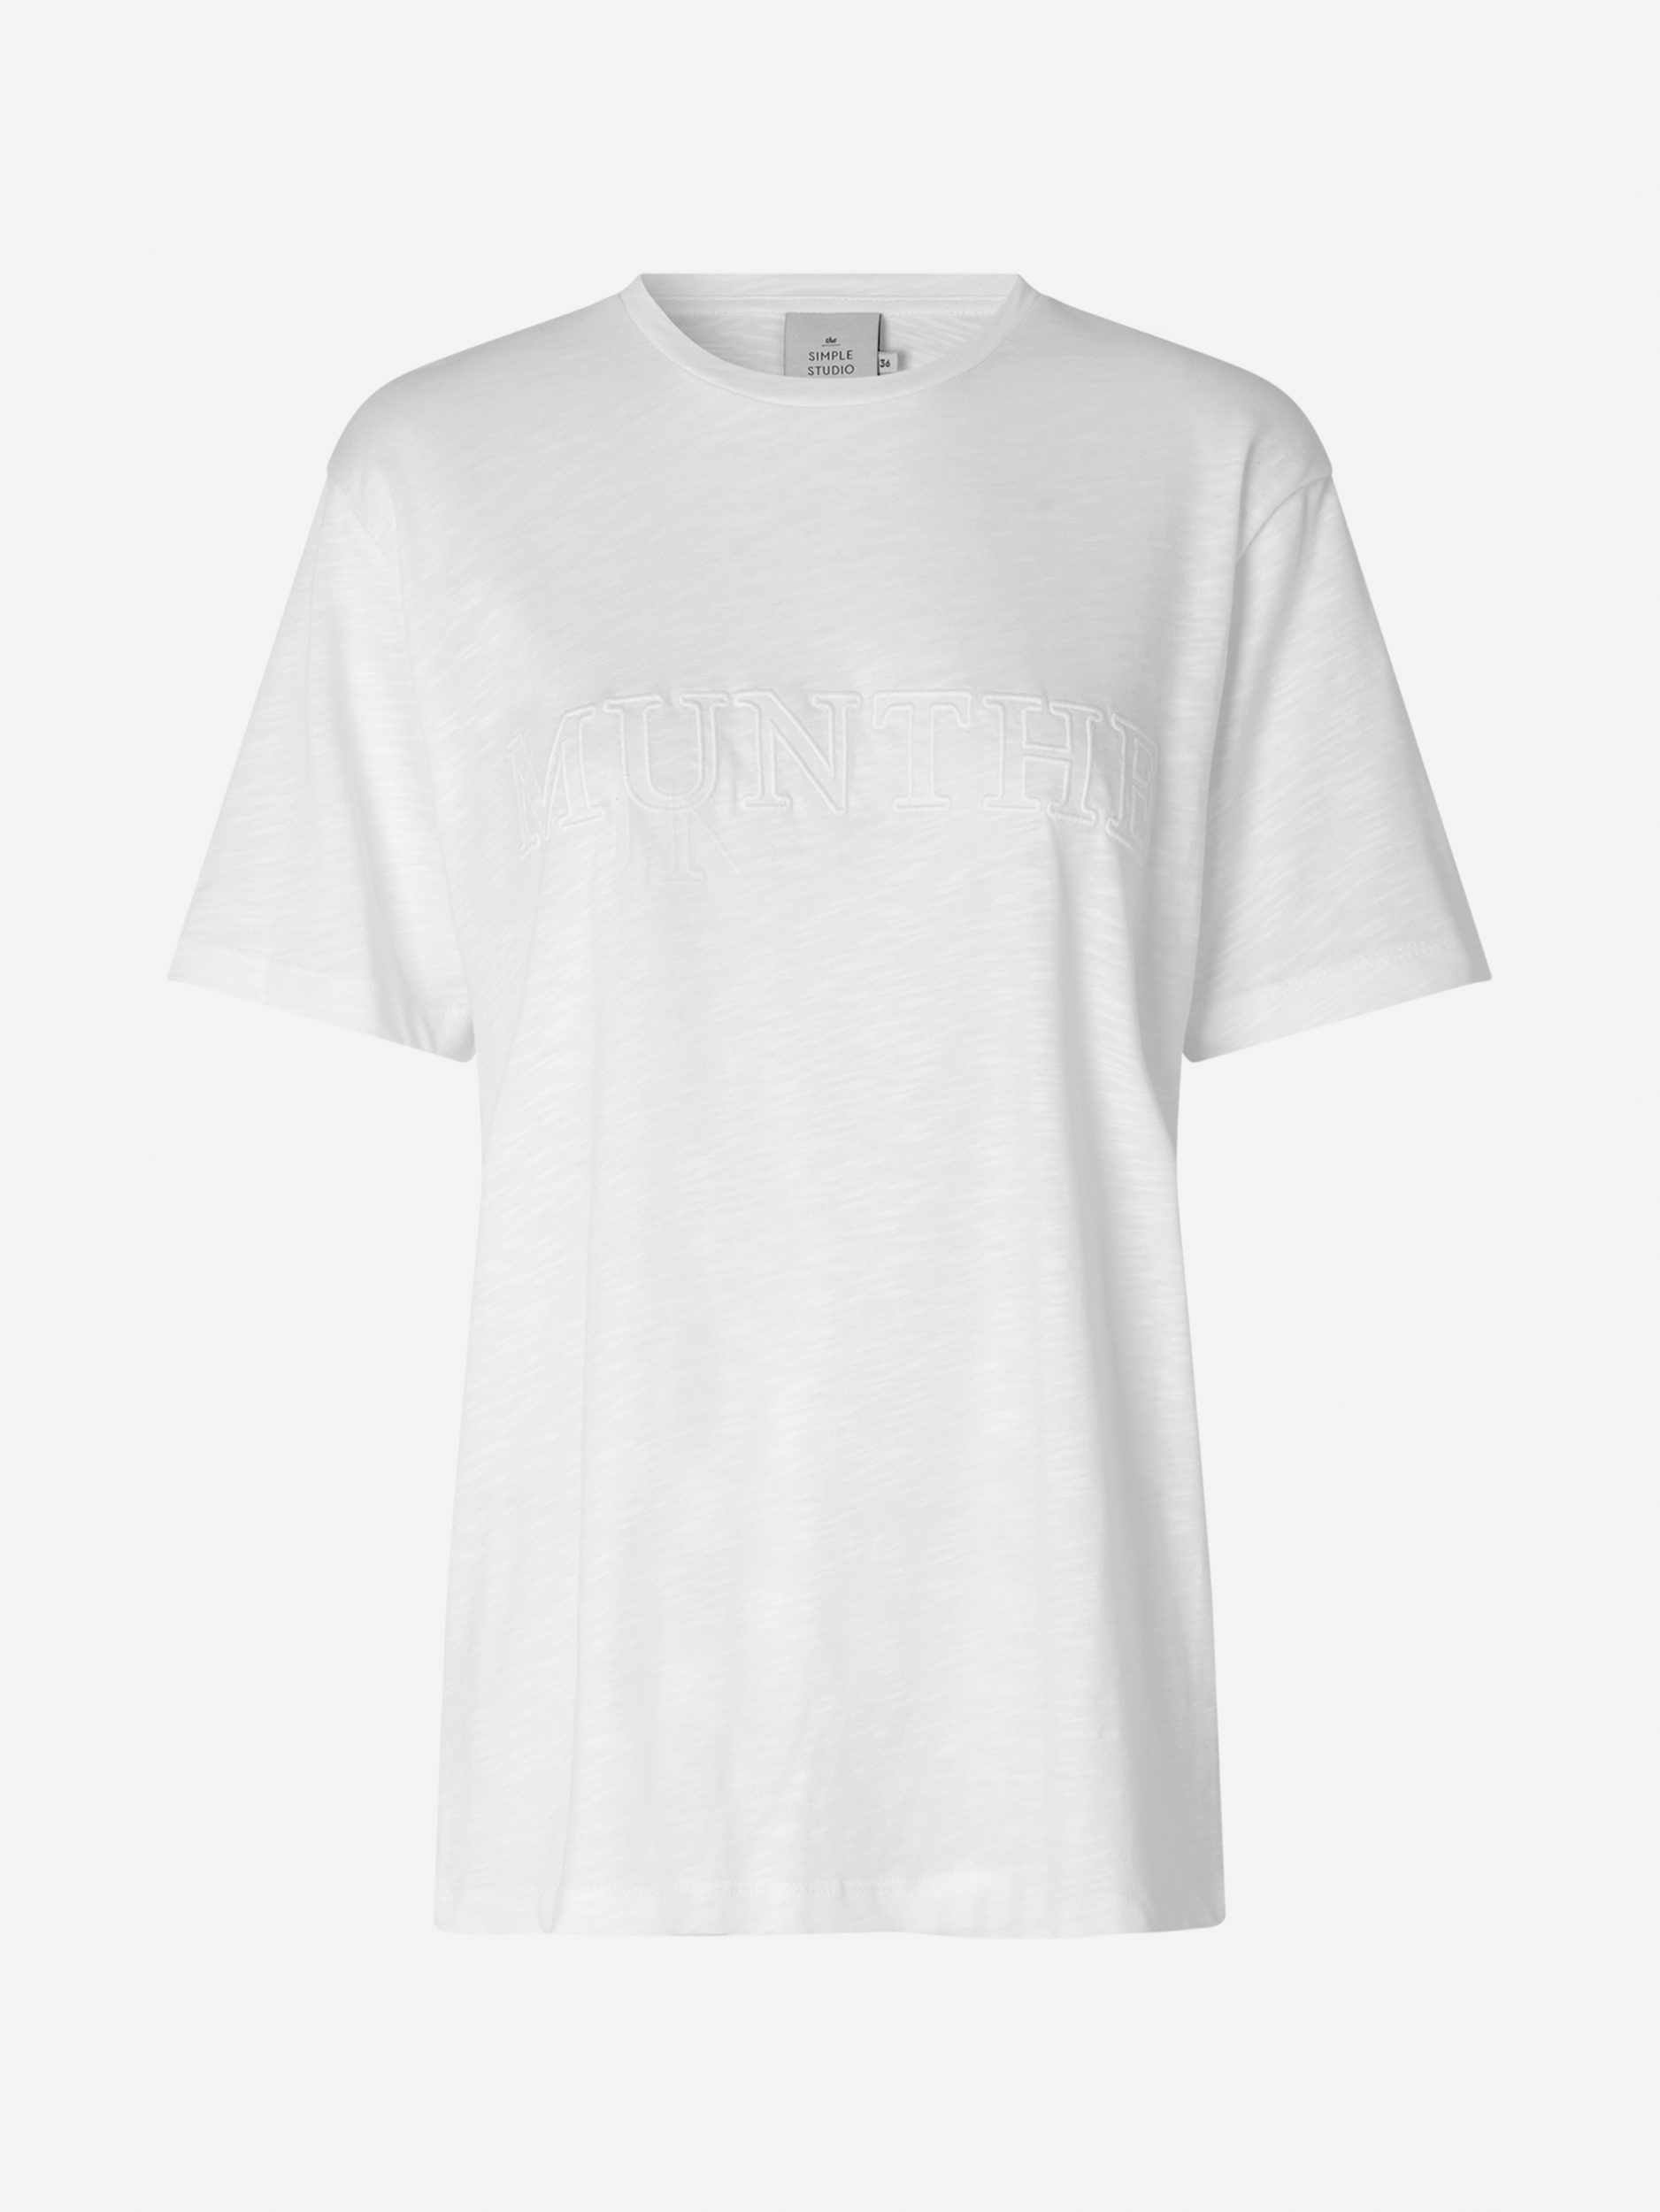 Munthe Pumpkin t-shirt, white, 34